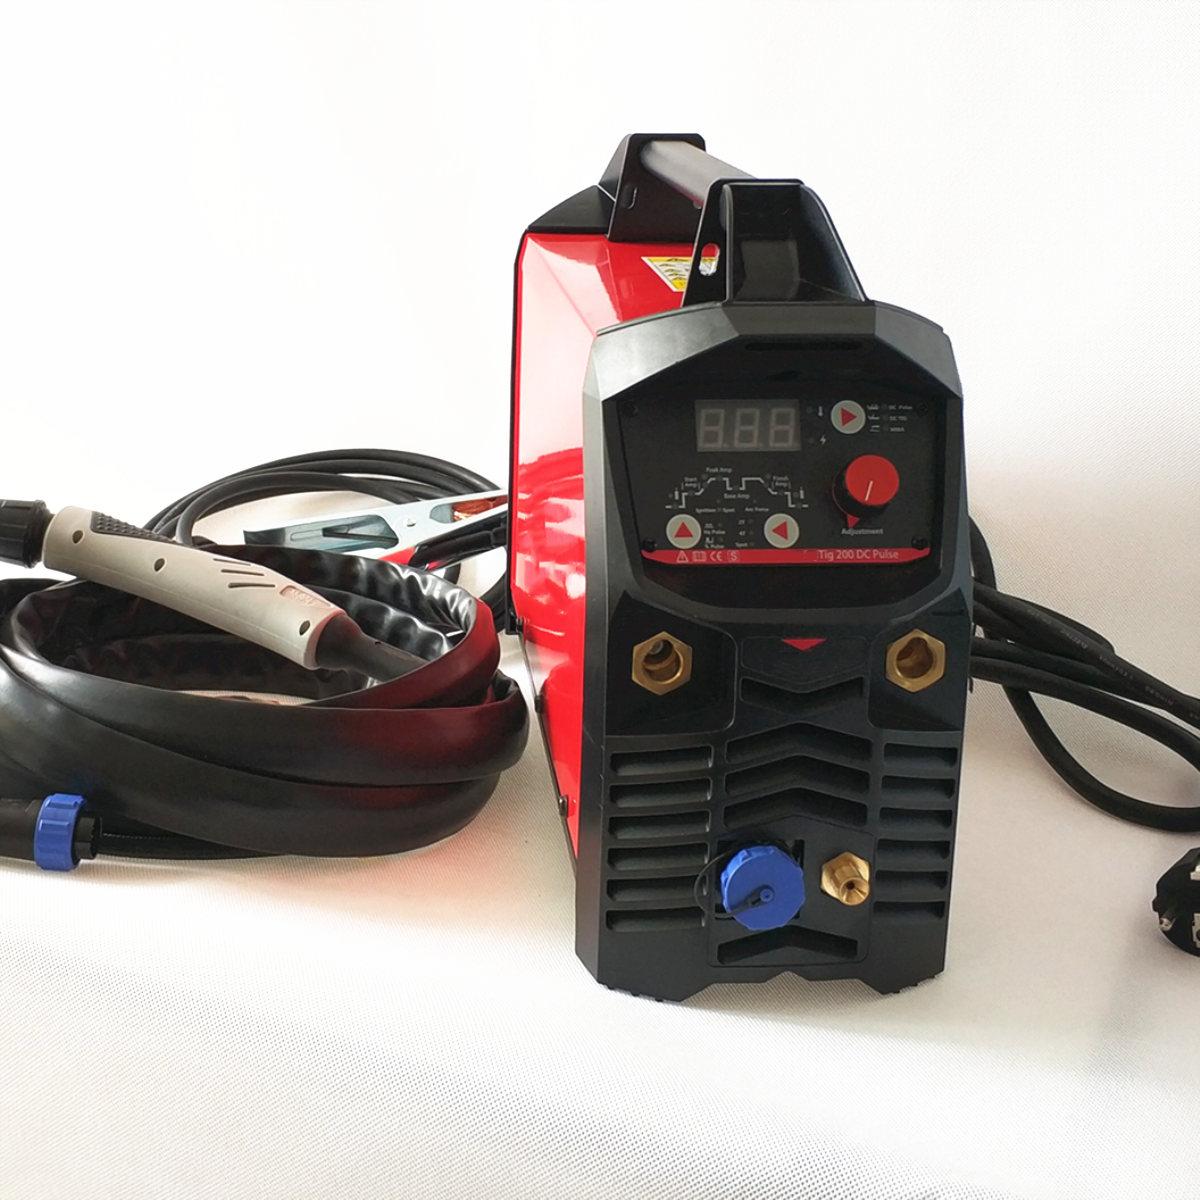 Professional Digital TIG 200A Pulse Welding Machine Hot Start HF Ignition Anti Stick Arc Force CE